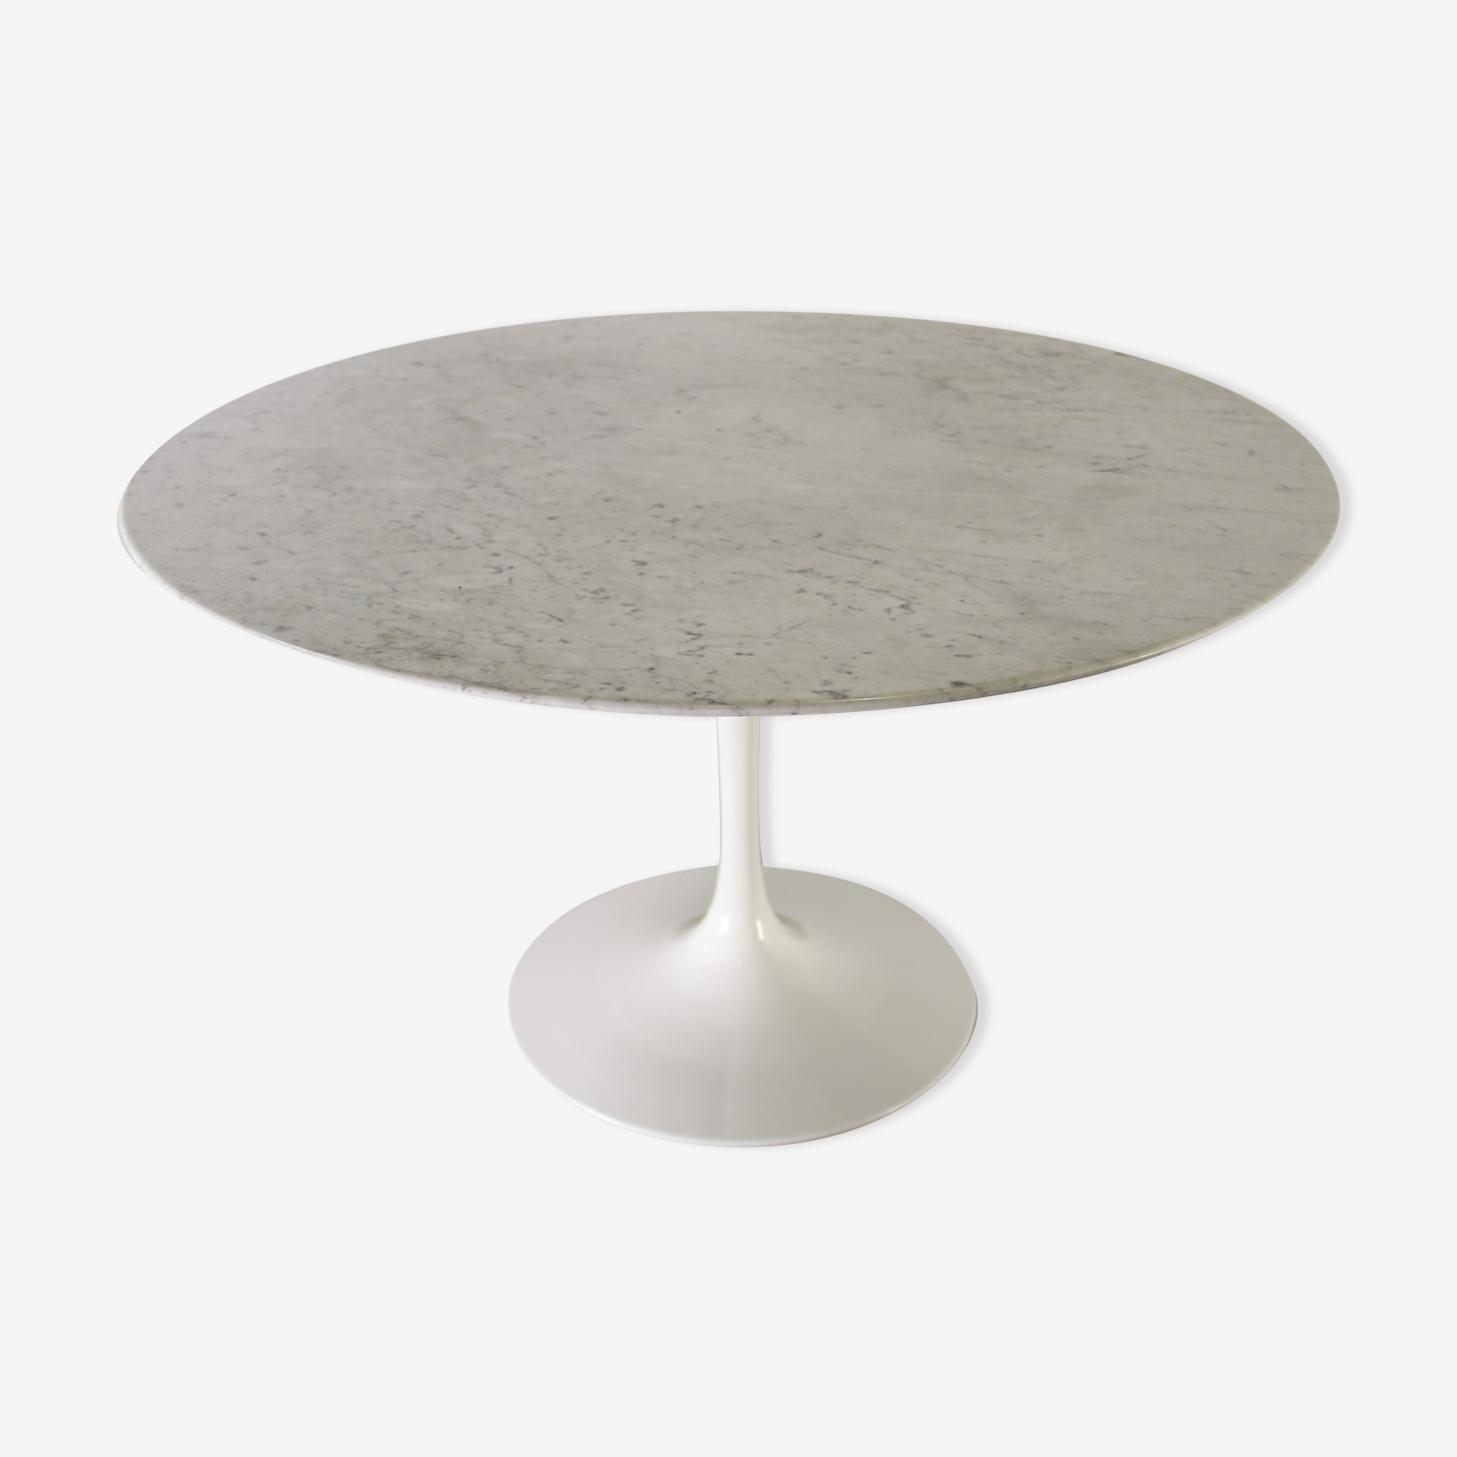 Table basse tulipe marbre Saarinen pour Knoll